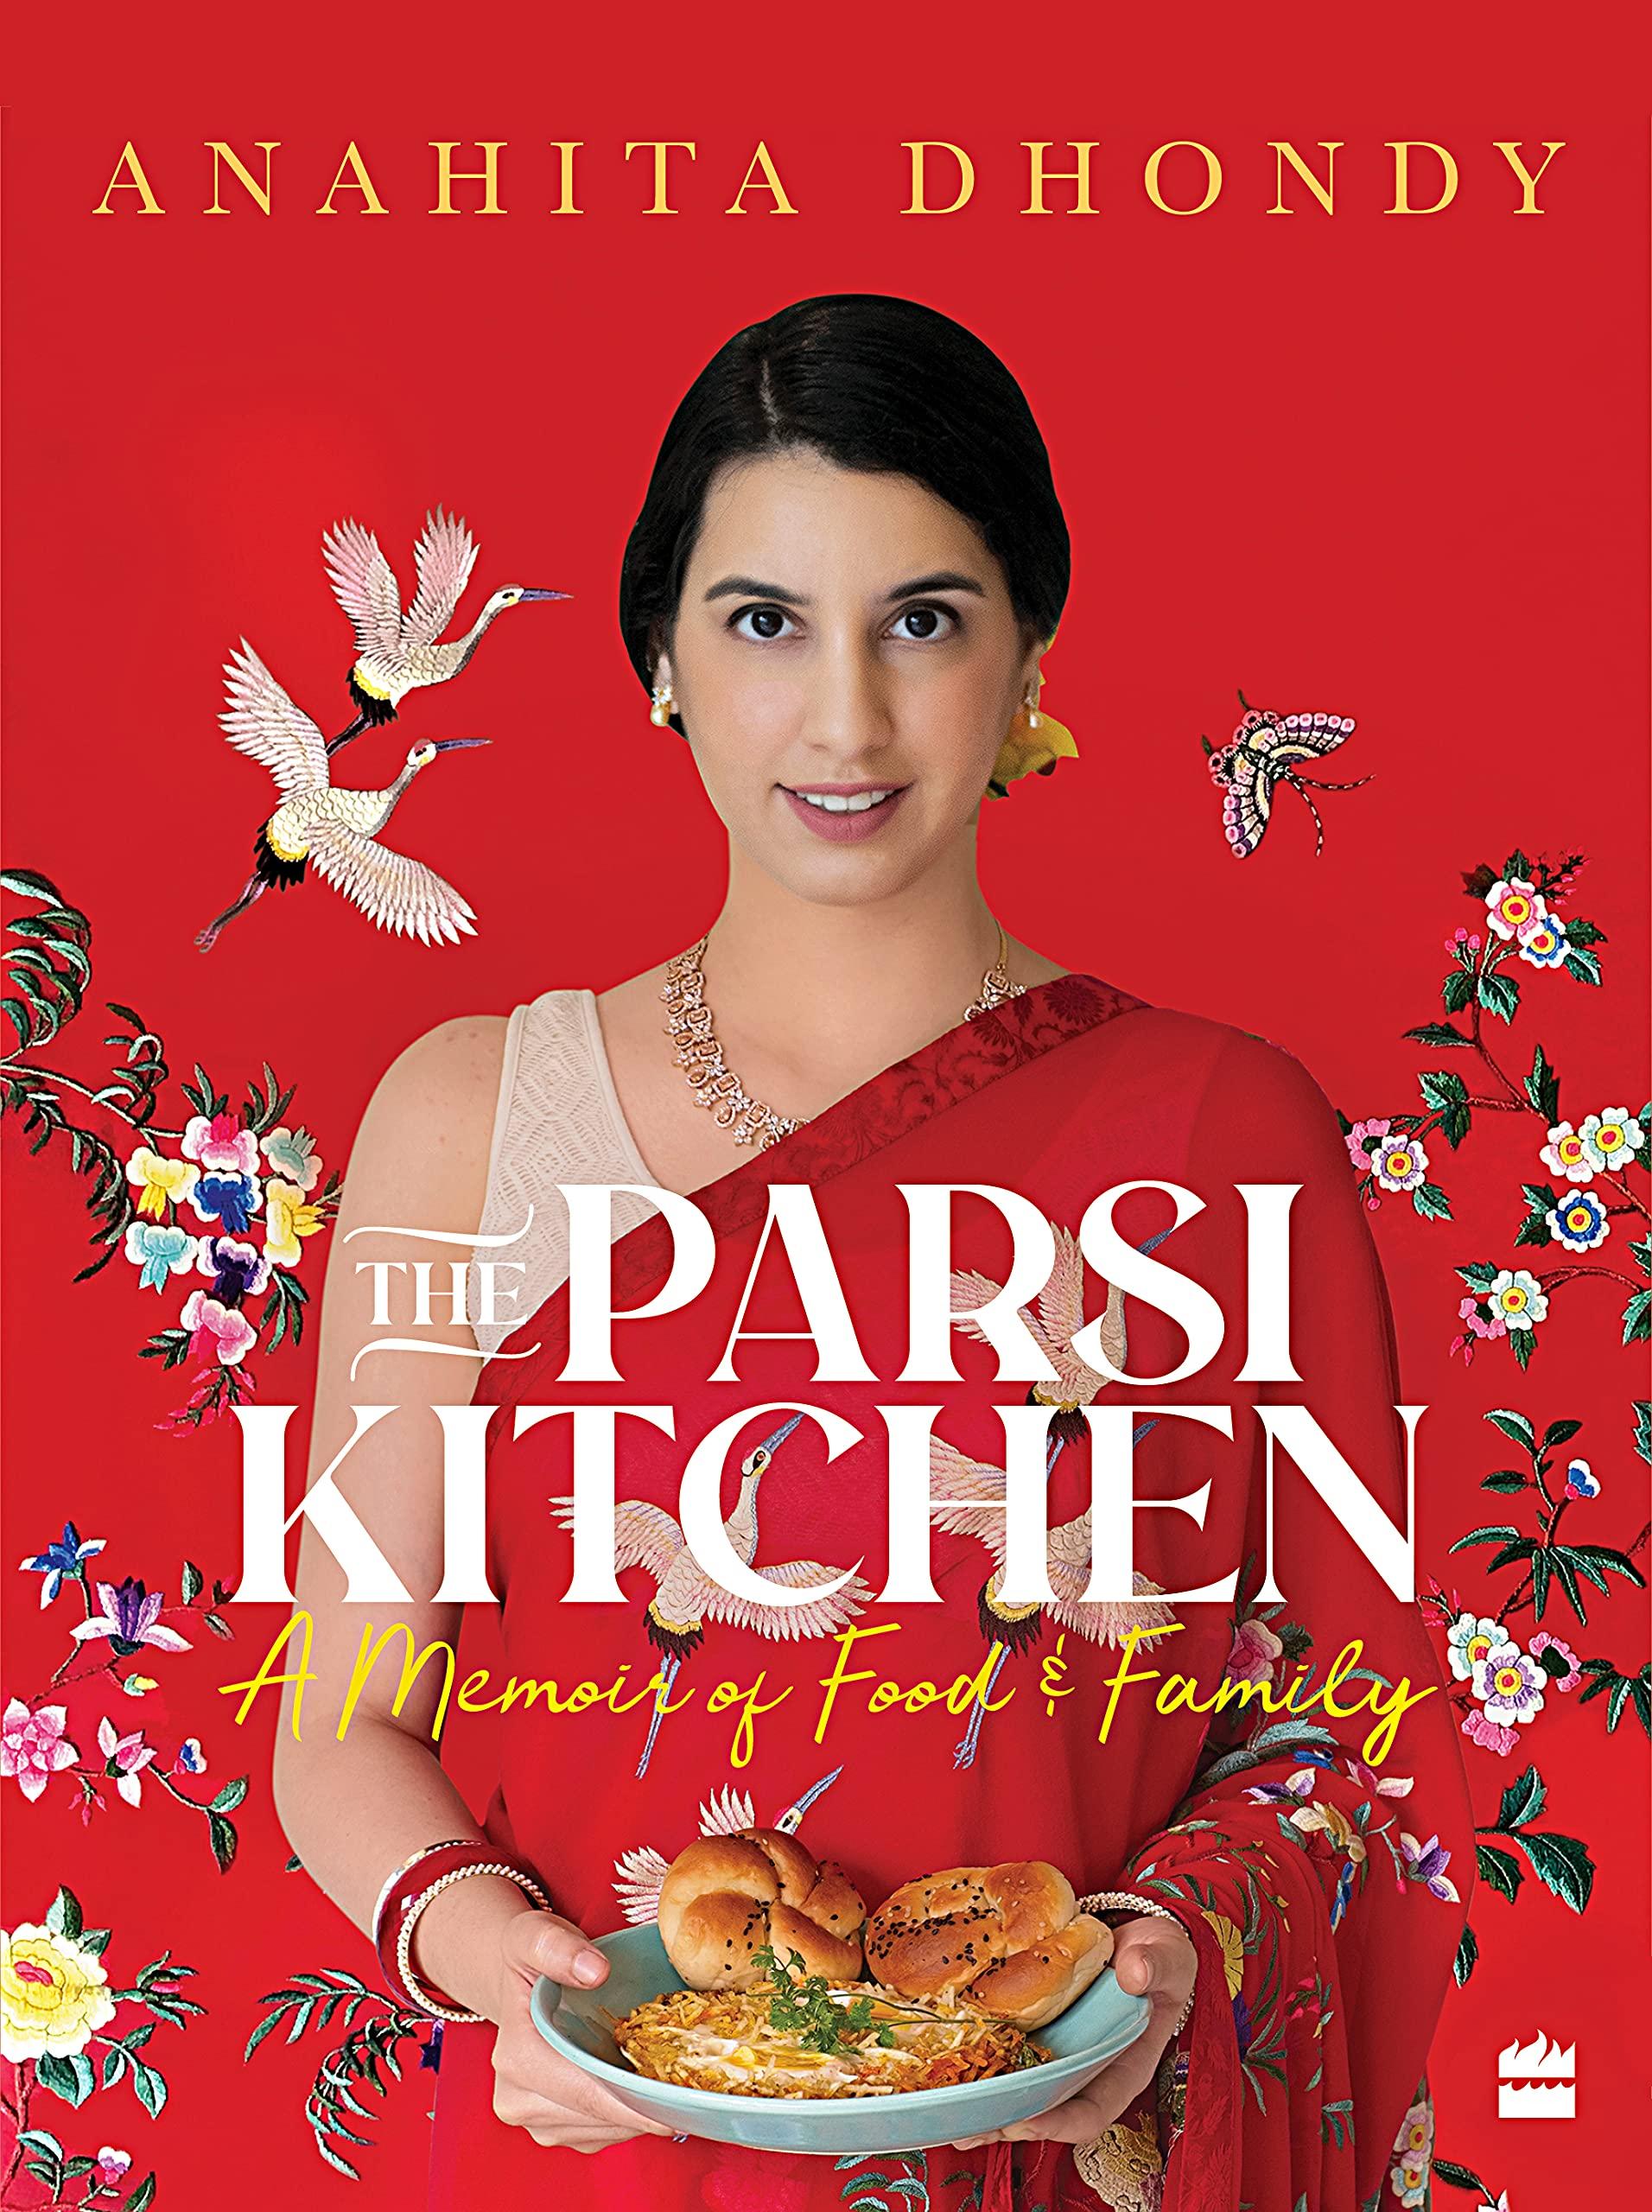 The Parsi Kitchen by Anahita Dhondy